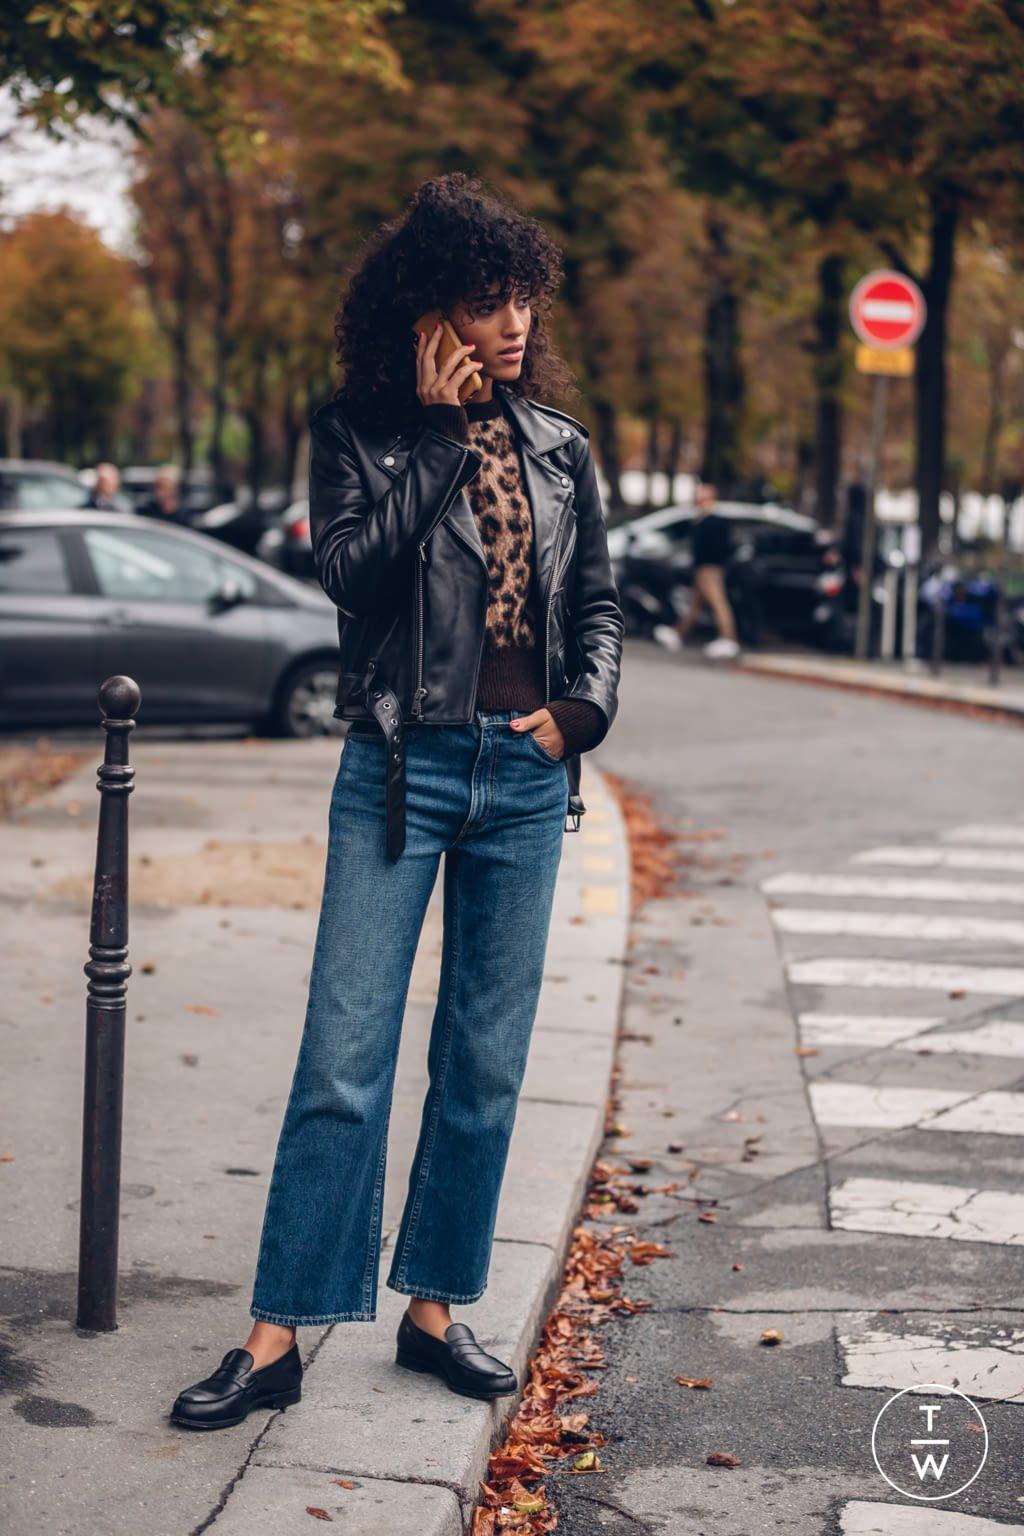 It girls - Mocassim - Mocassim - Verão - Street Style